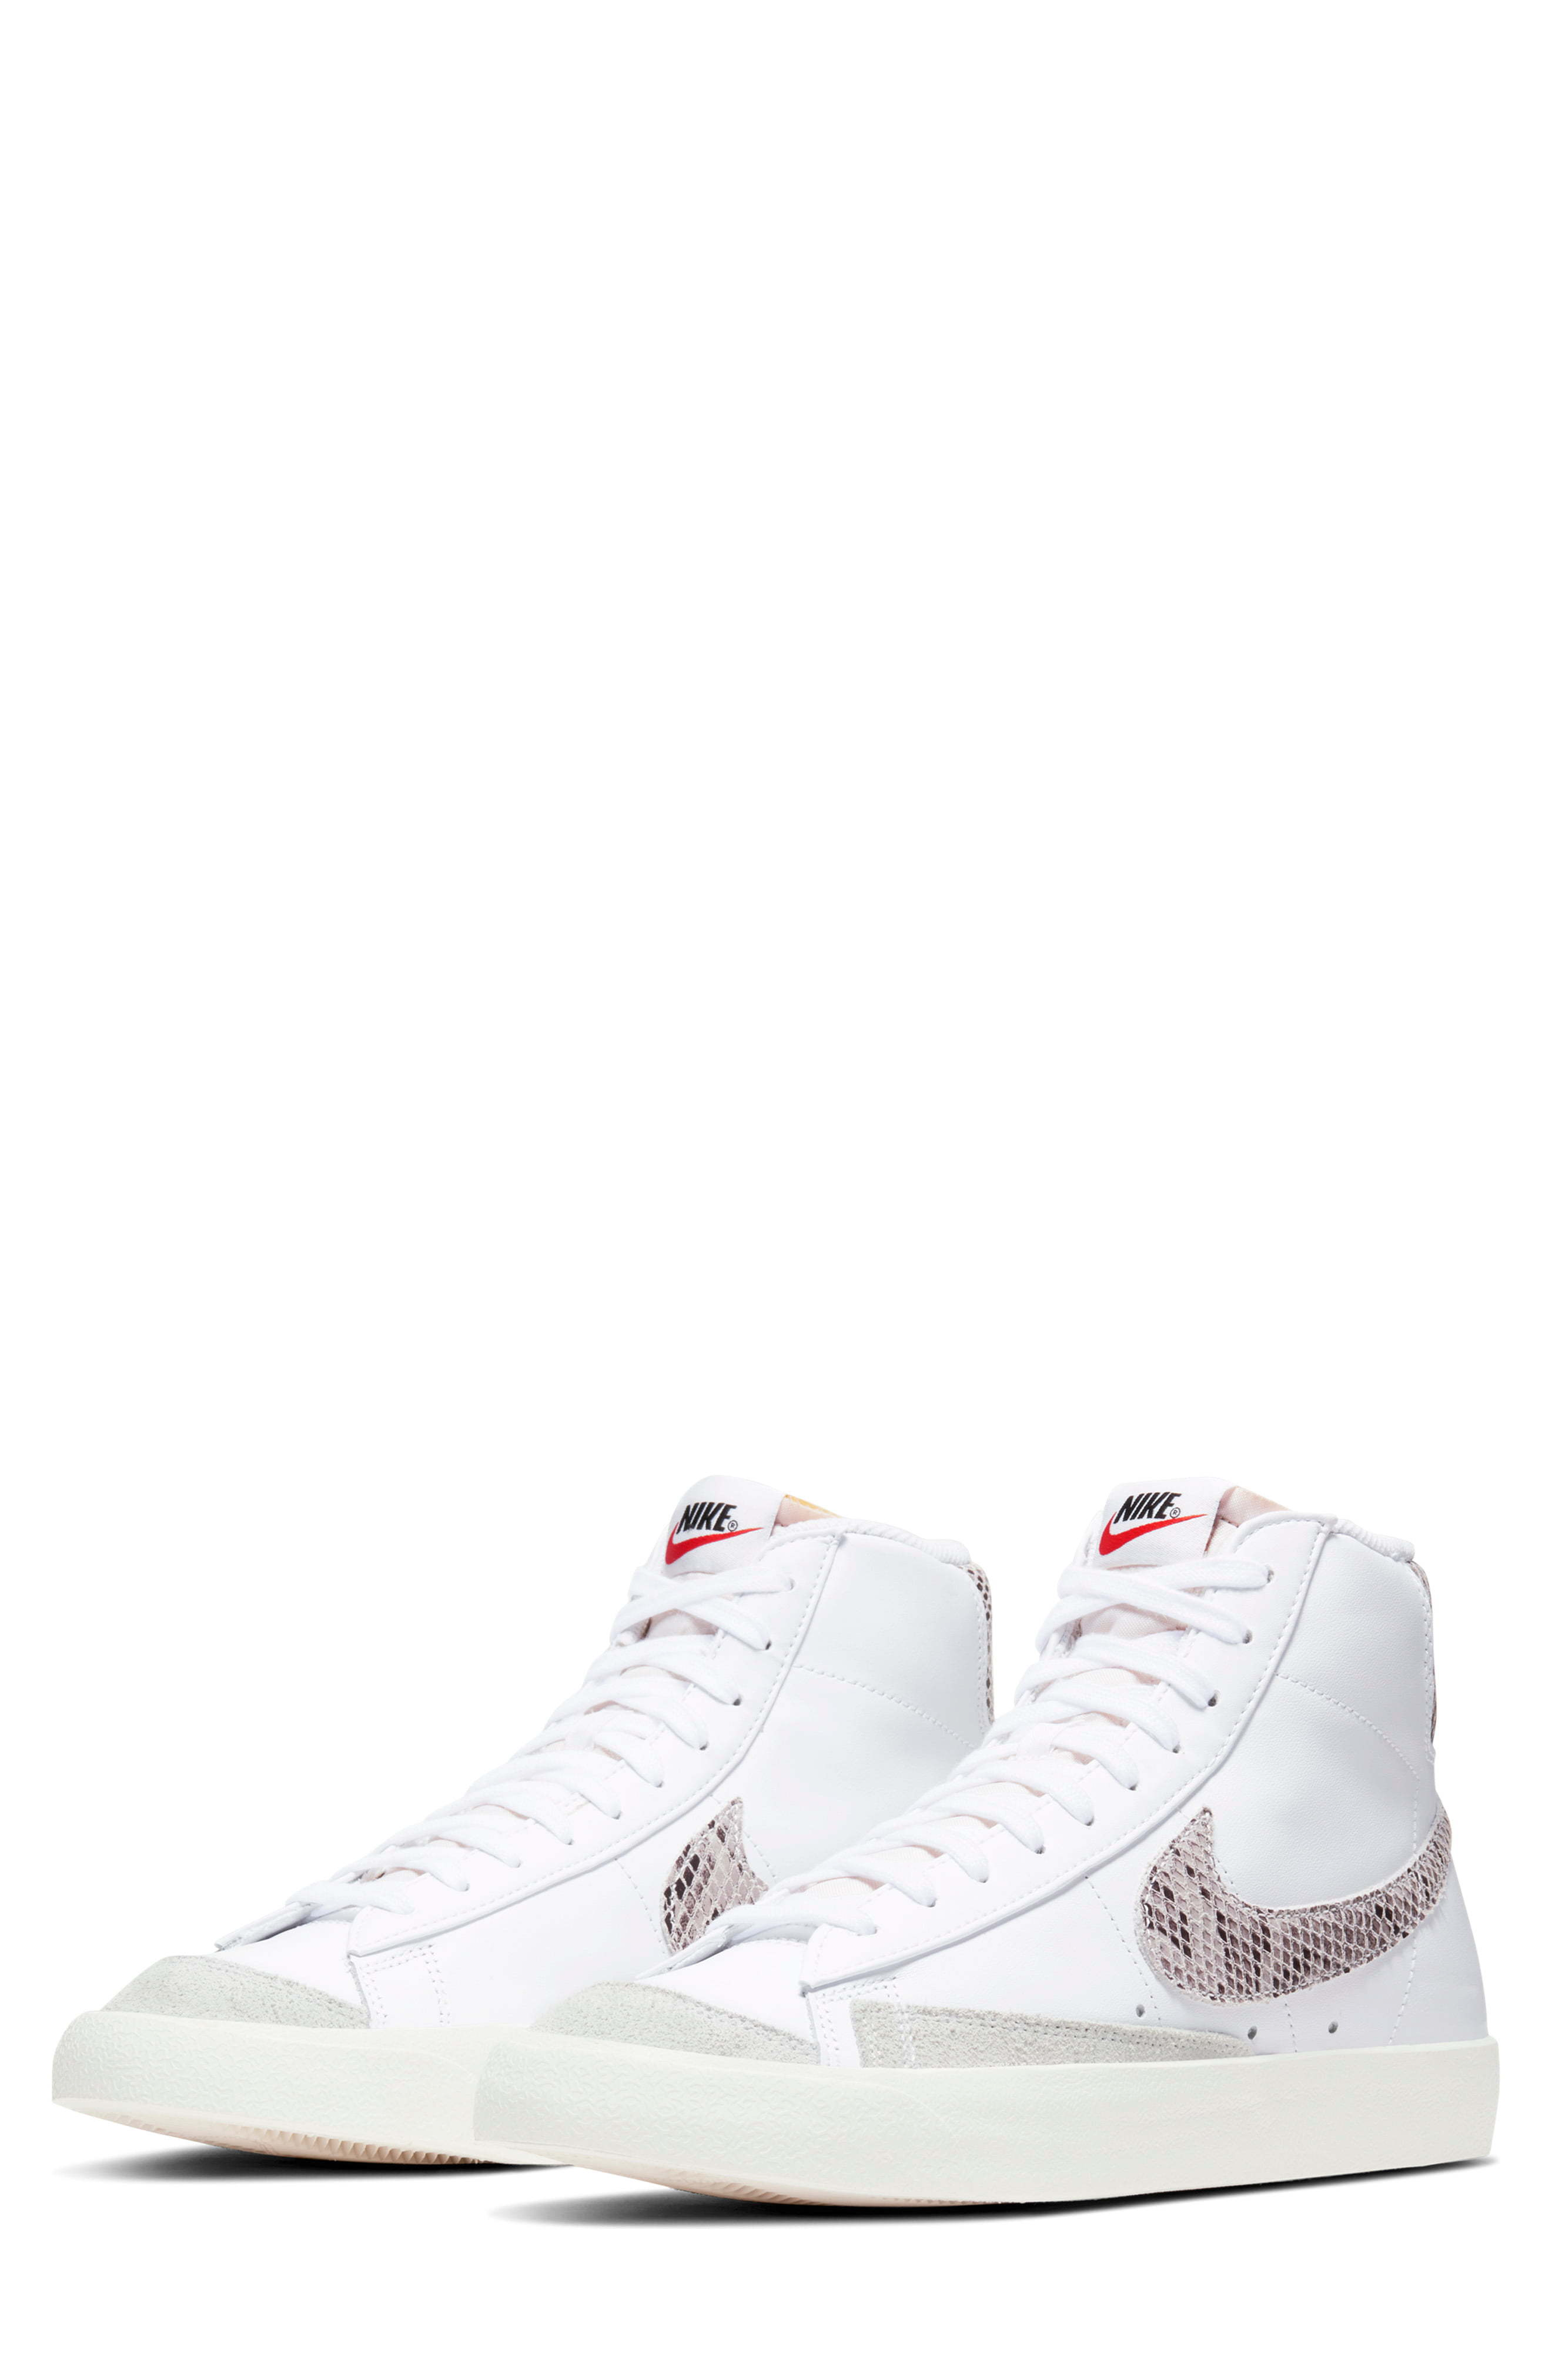 Nike Blazer Mid 77 Vintage Reptile Sneaker, $100 | Nordstrom ...